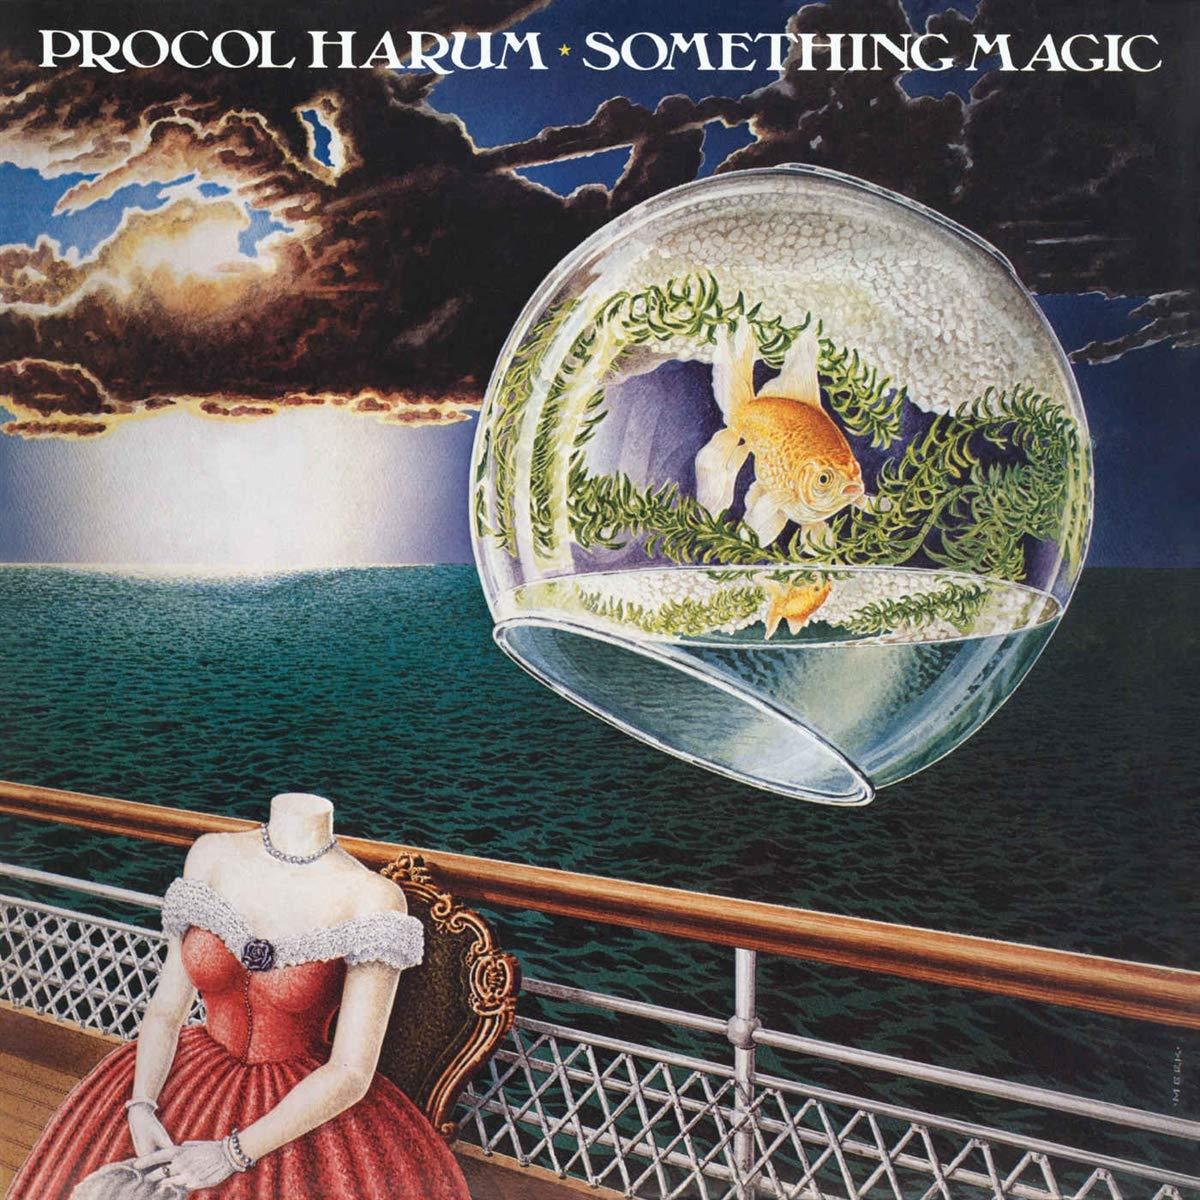 Procol Harum - Something Magic (2021) [FLAC] Download